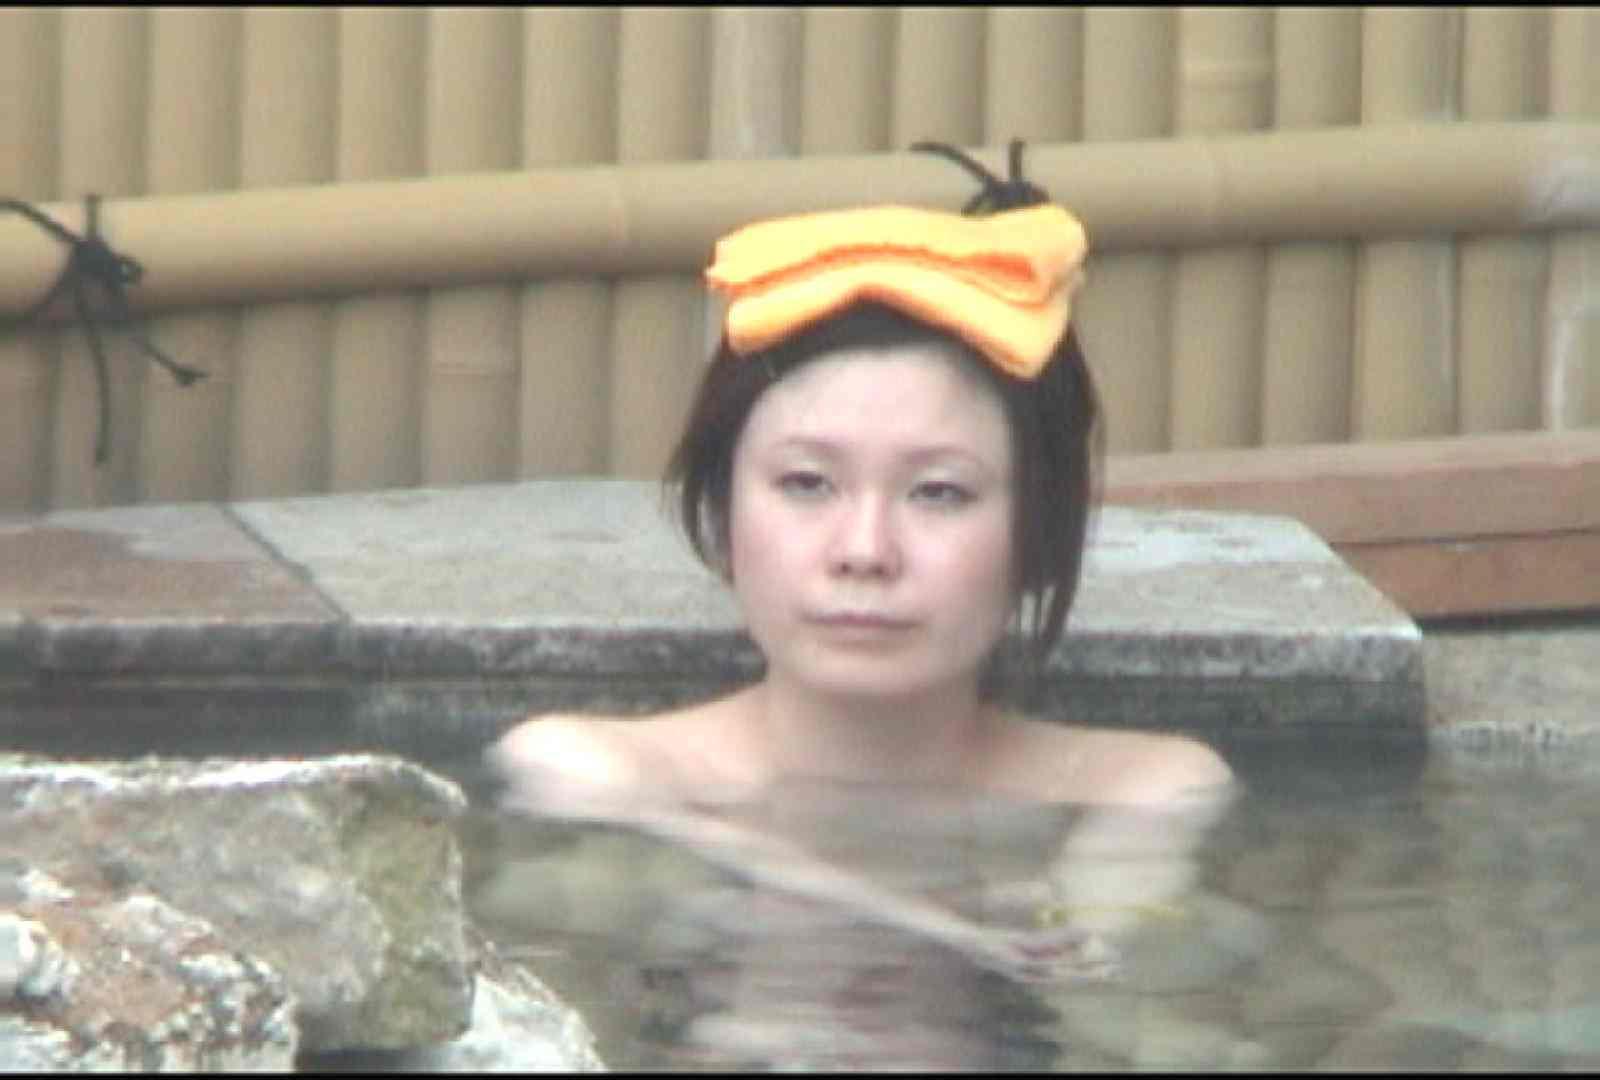 Aquaな露天風呂Vol.177 綺麗なOLたち アダルト動画キャプチャ 112枚 47